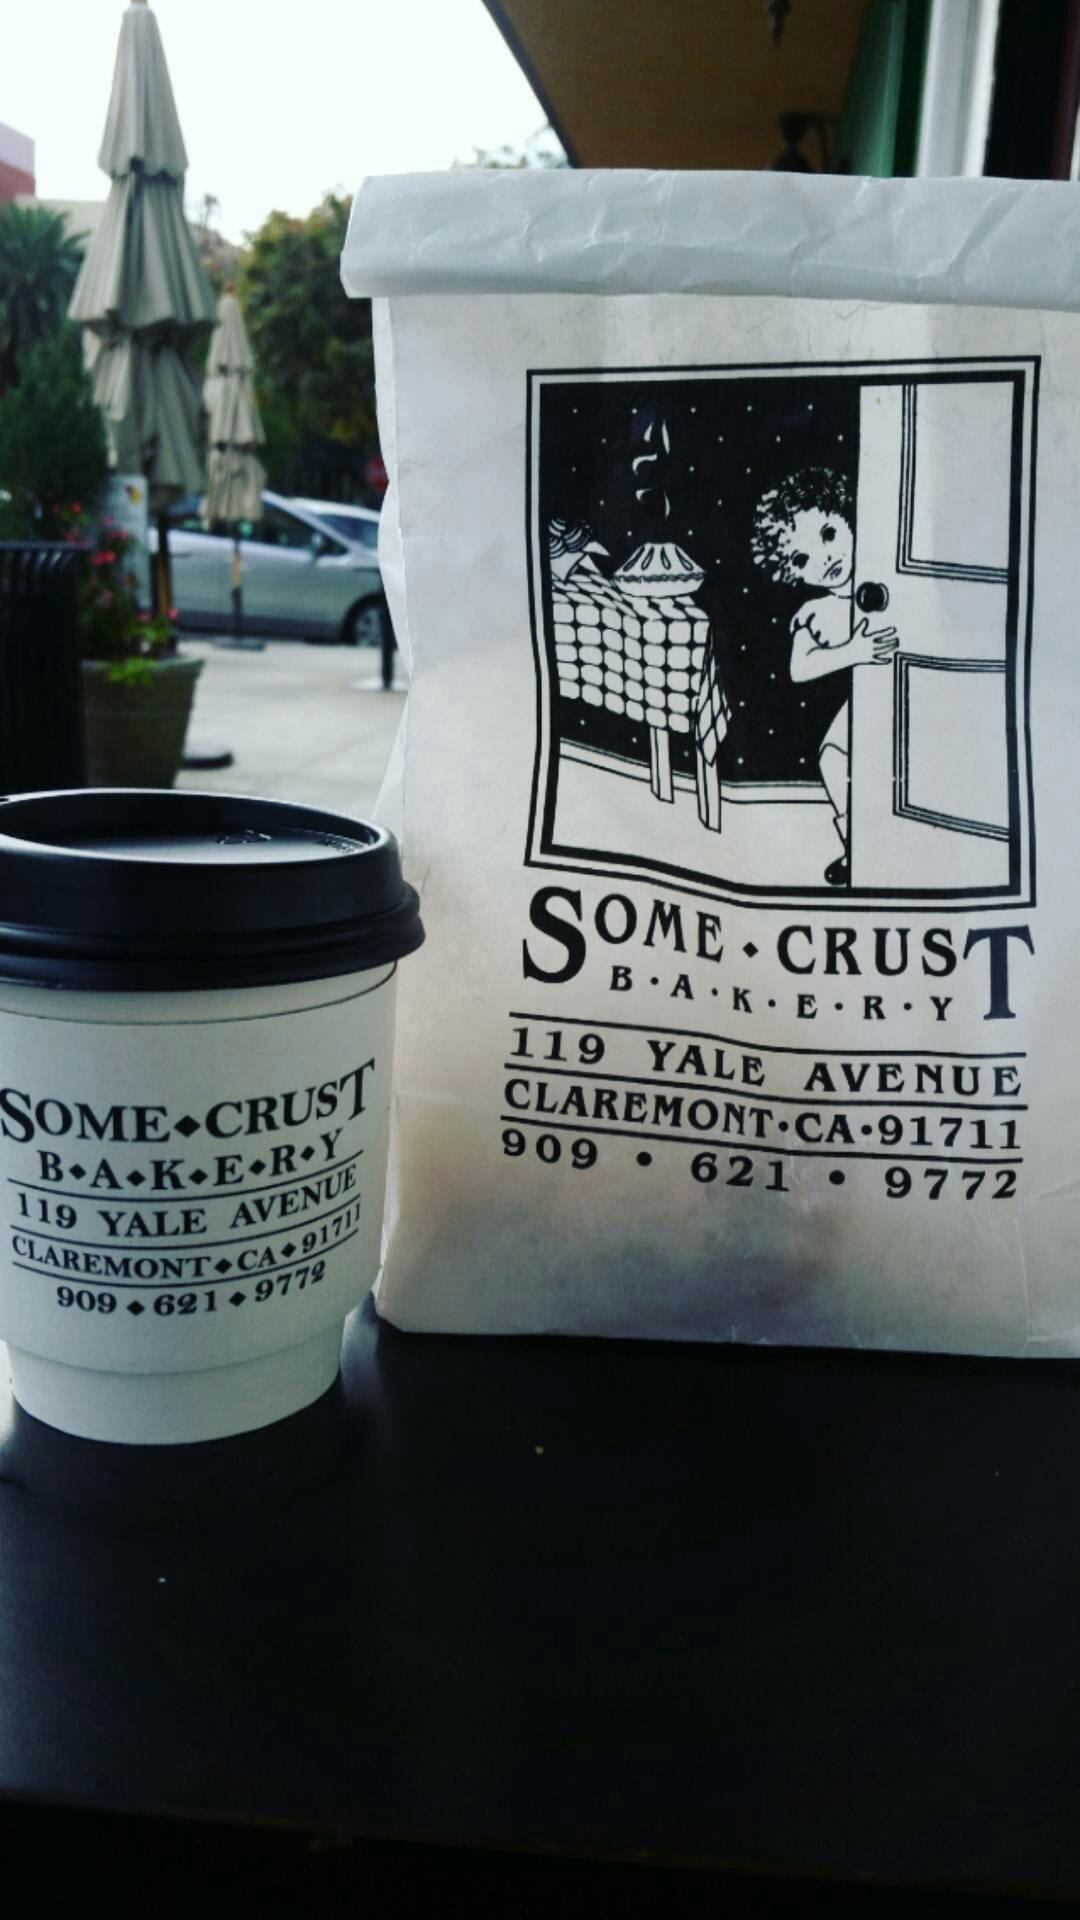 Some Crust Breakfast.jpg